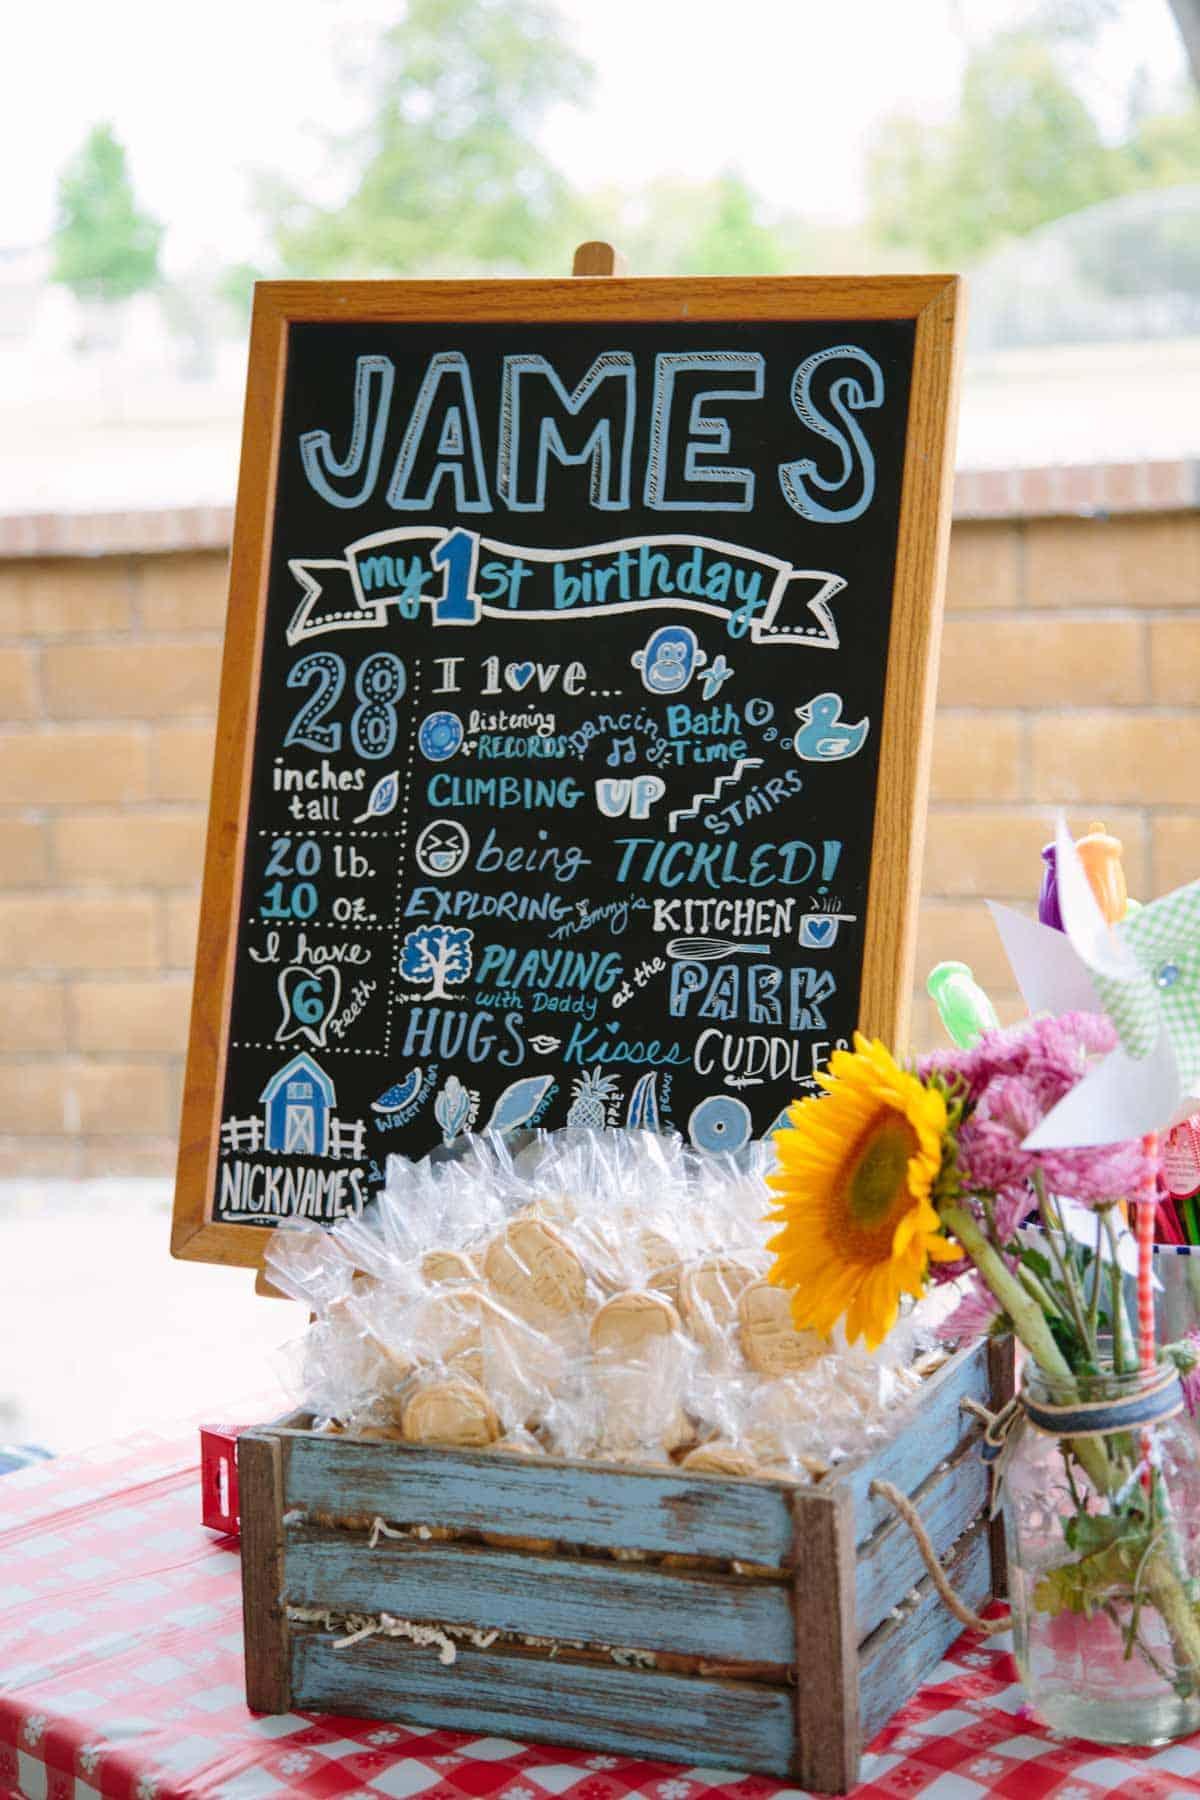 james-1st-bday-chalk-board